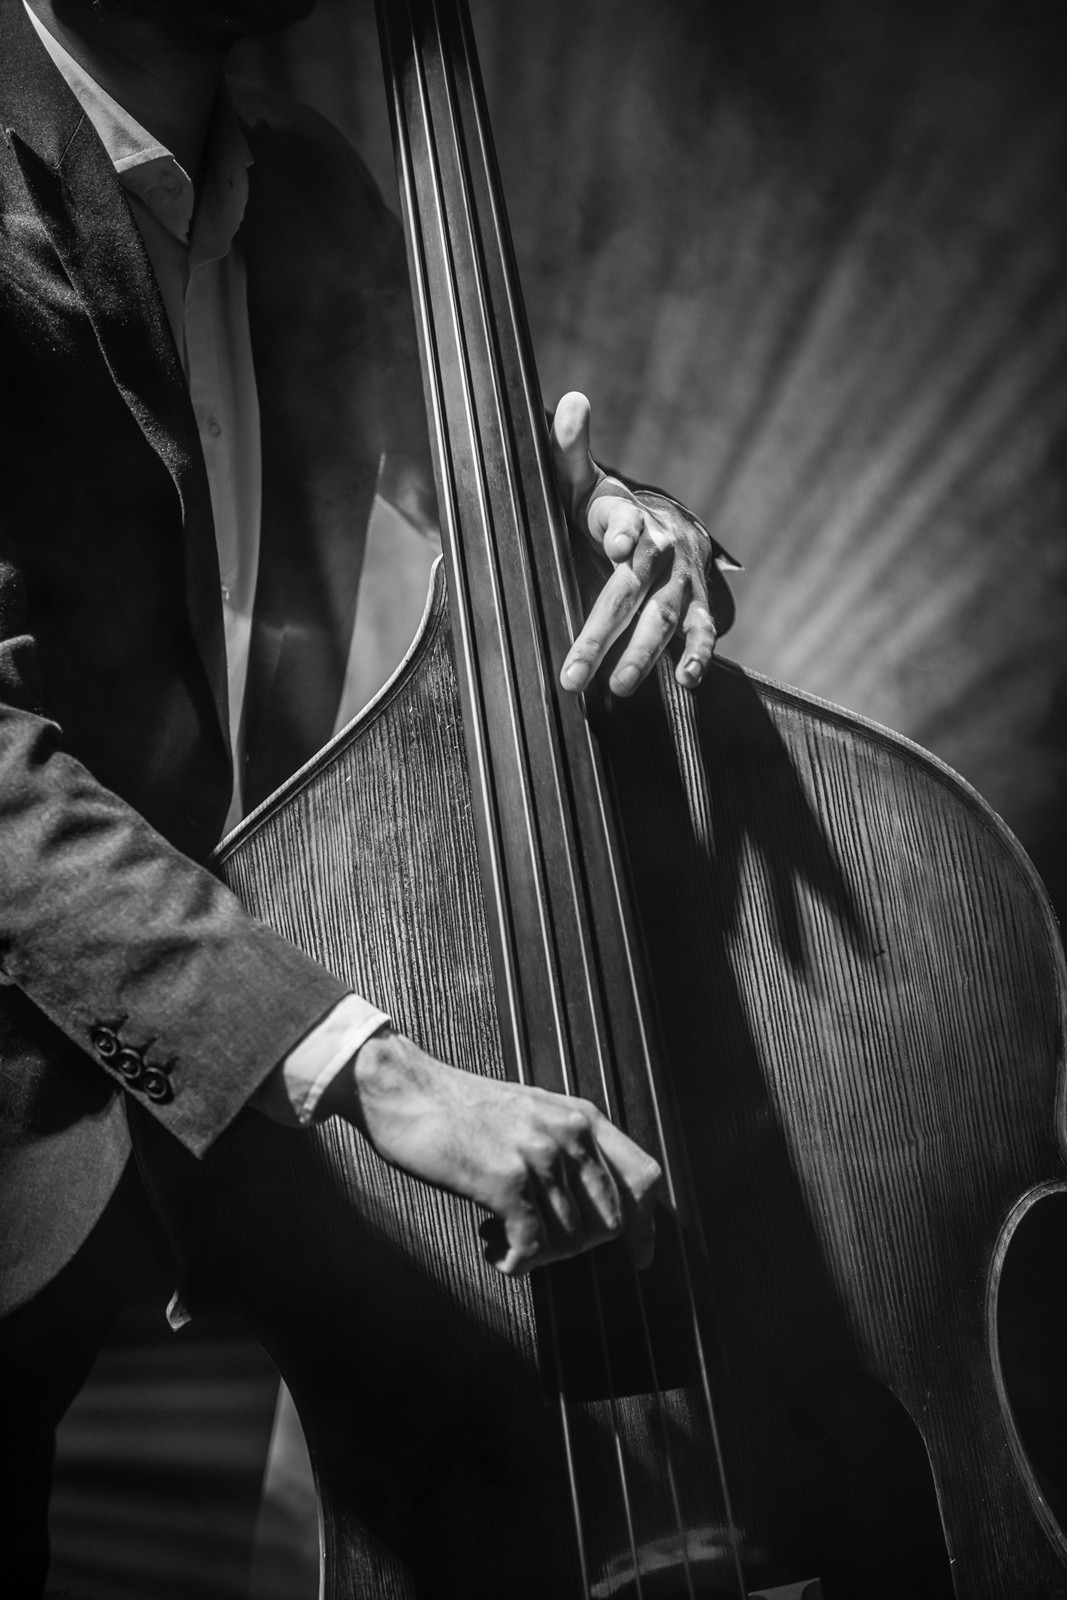 Double bass player by portrait photographer Paul Ward